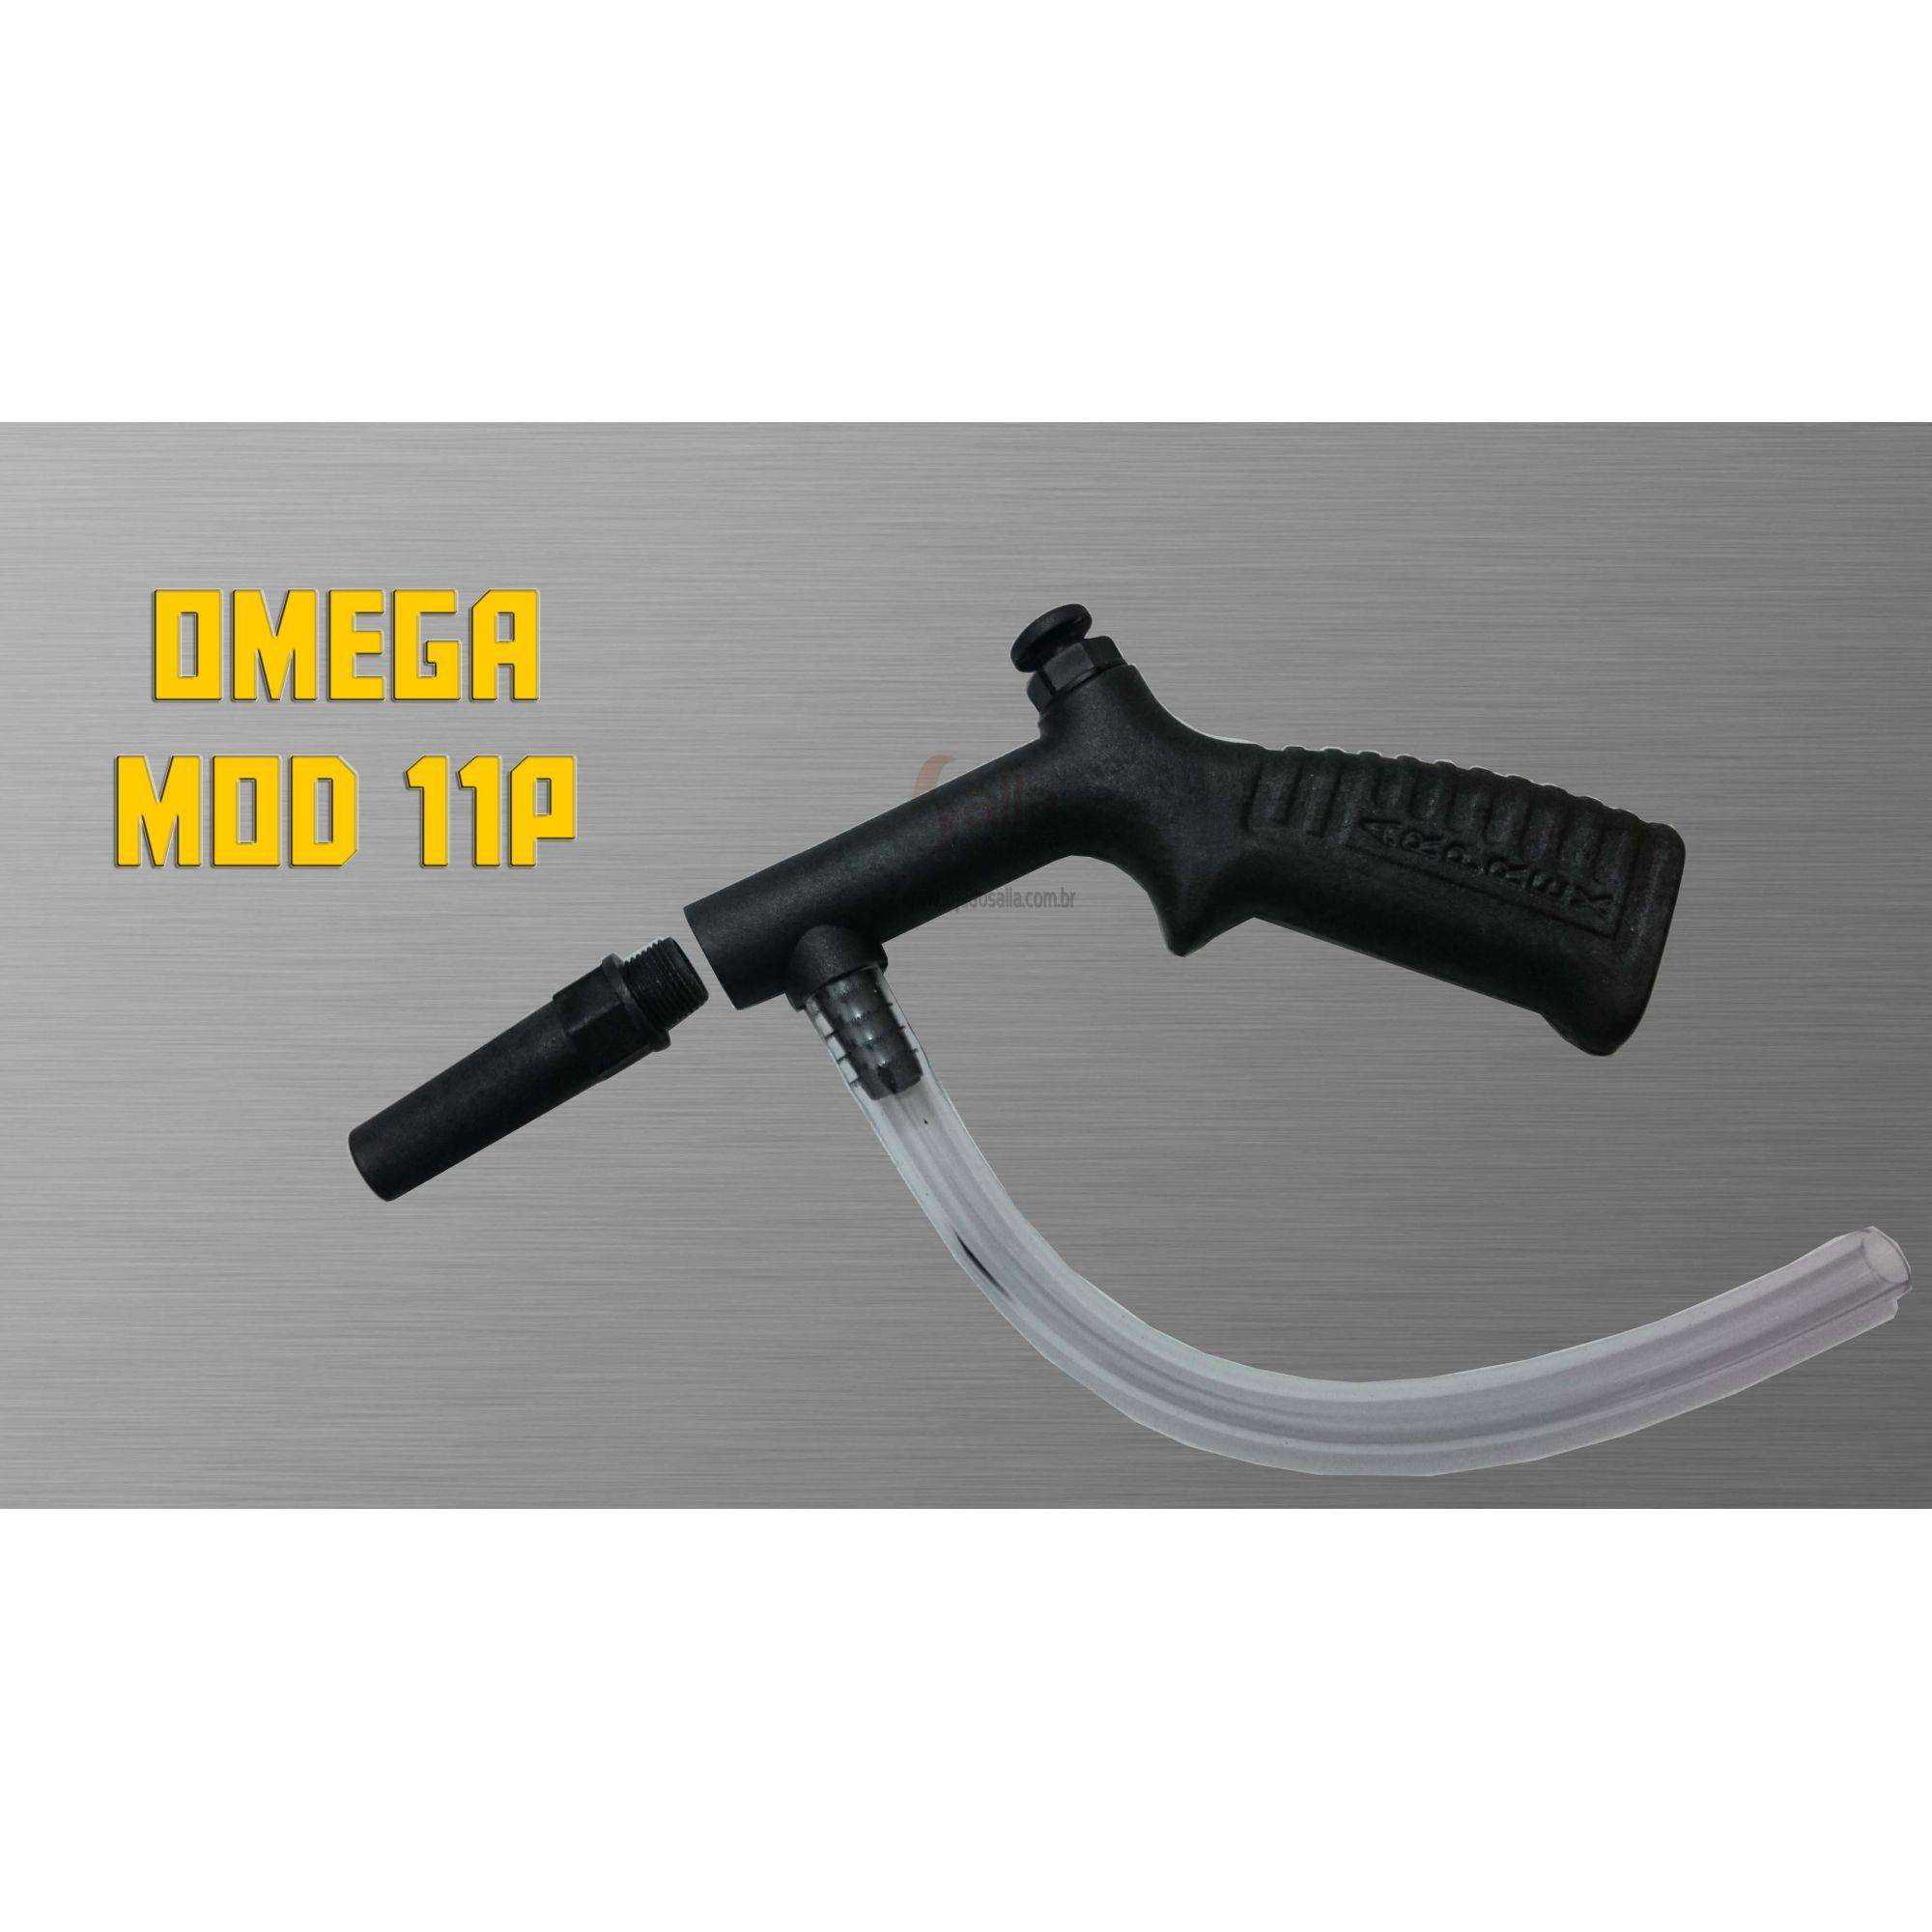 Bico de Ar / Pistola de Pulverização Mod 11P Arprex